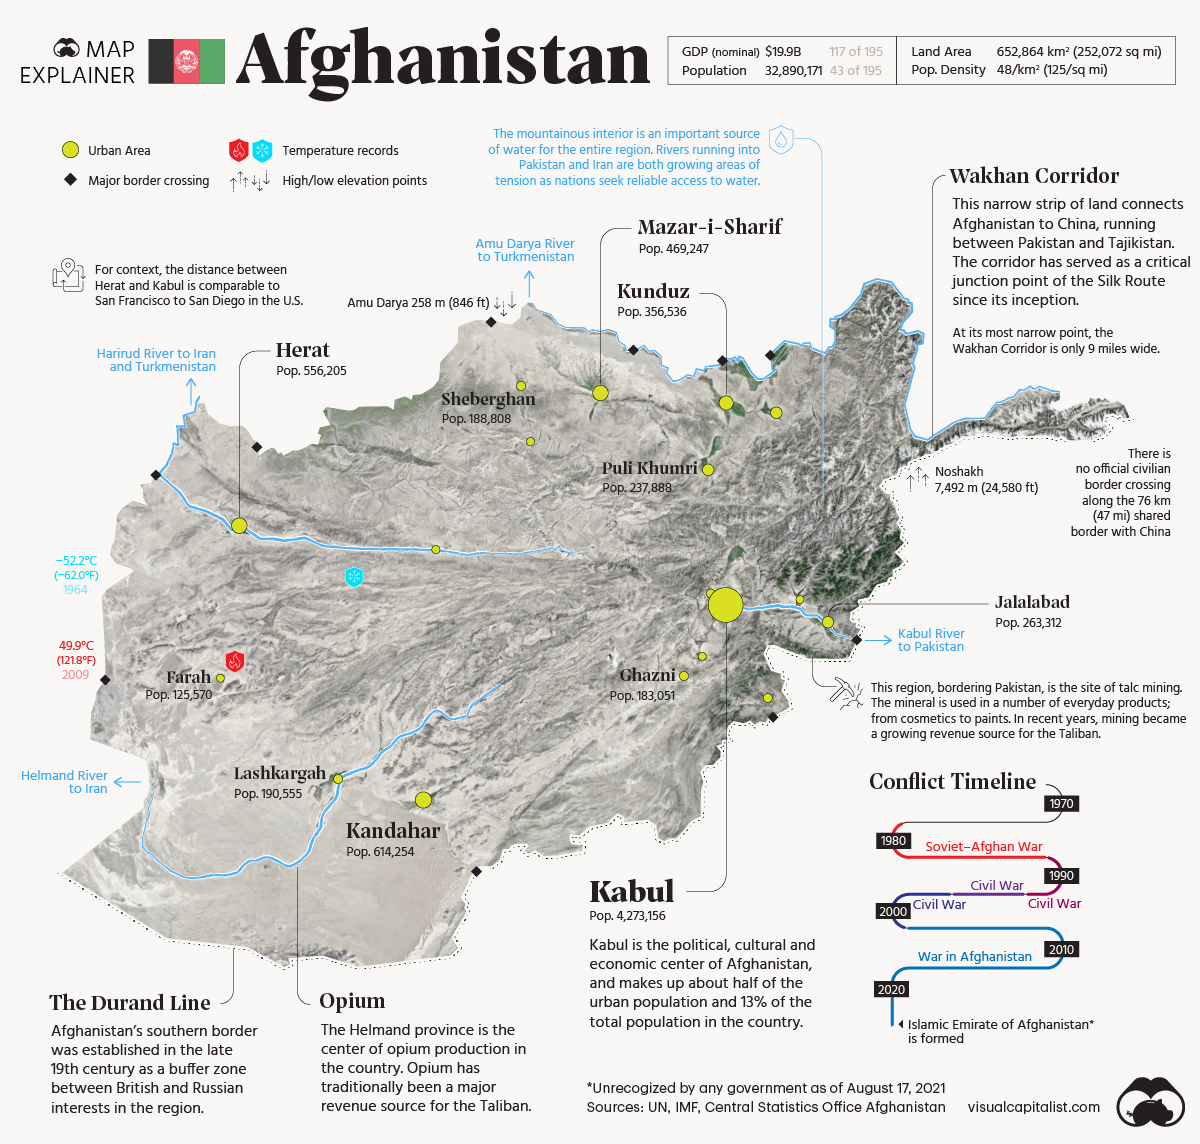 afghanistan map explainer